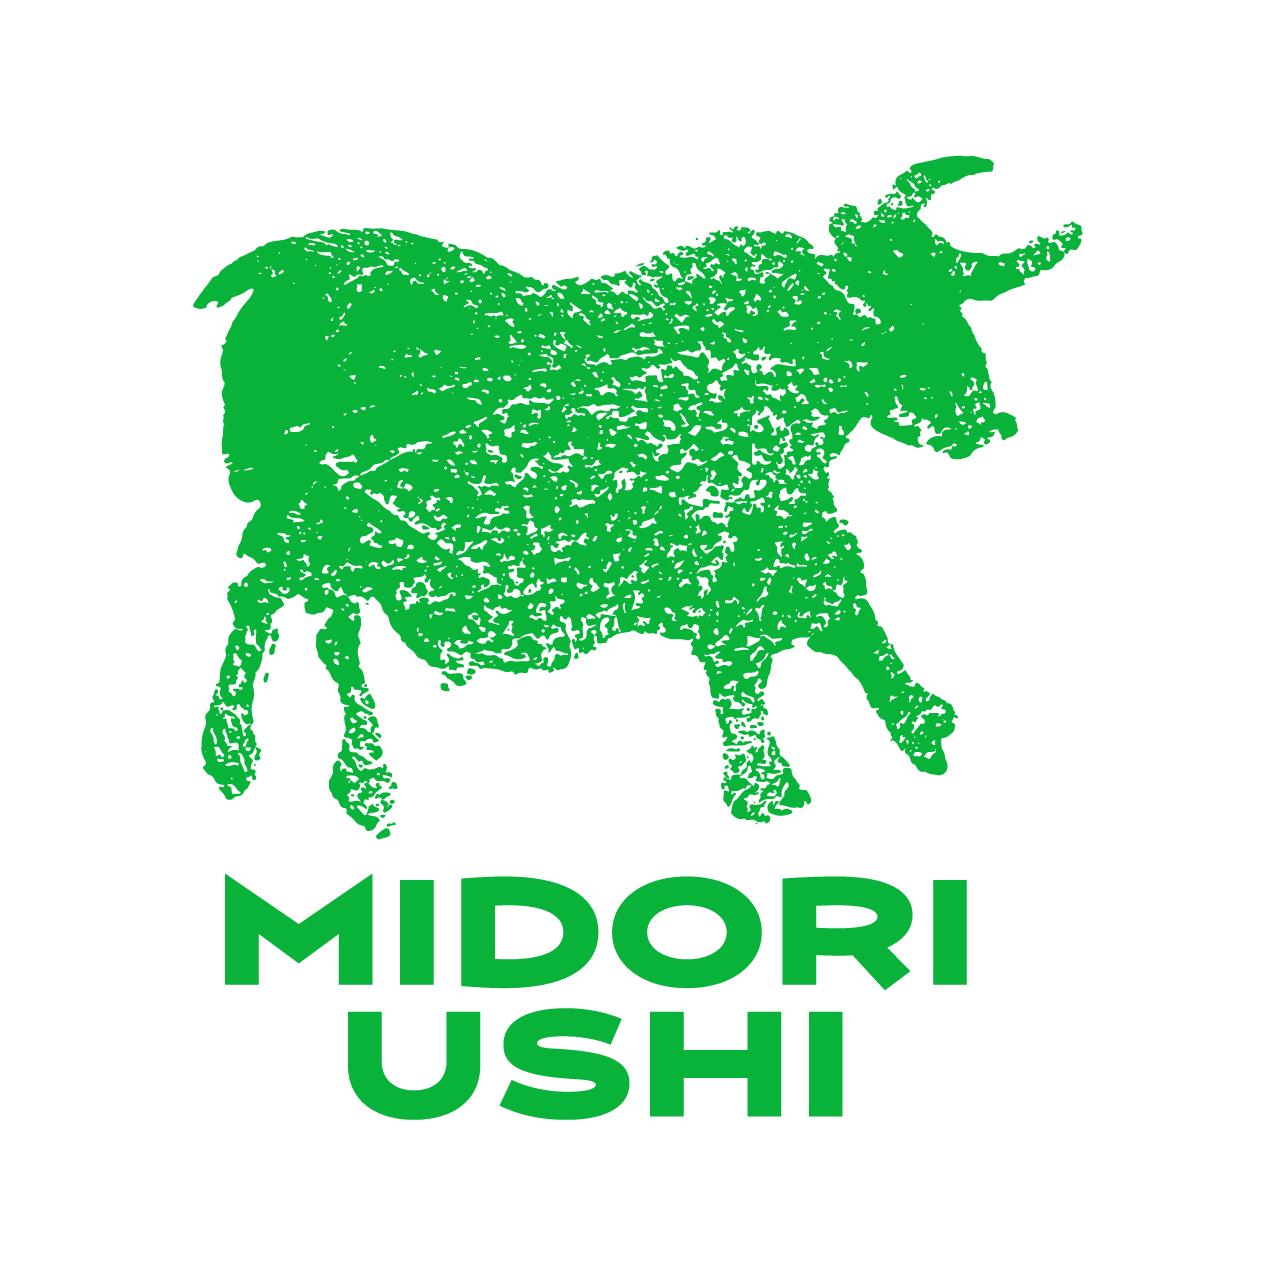 MIDORIUSHI